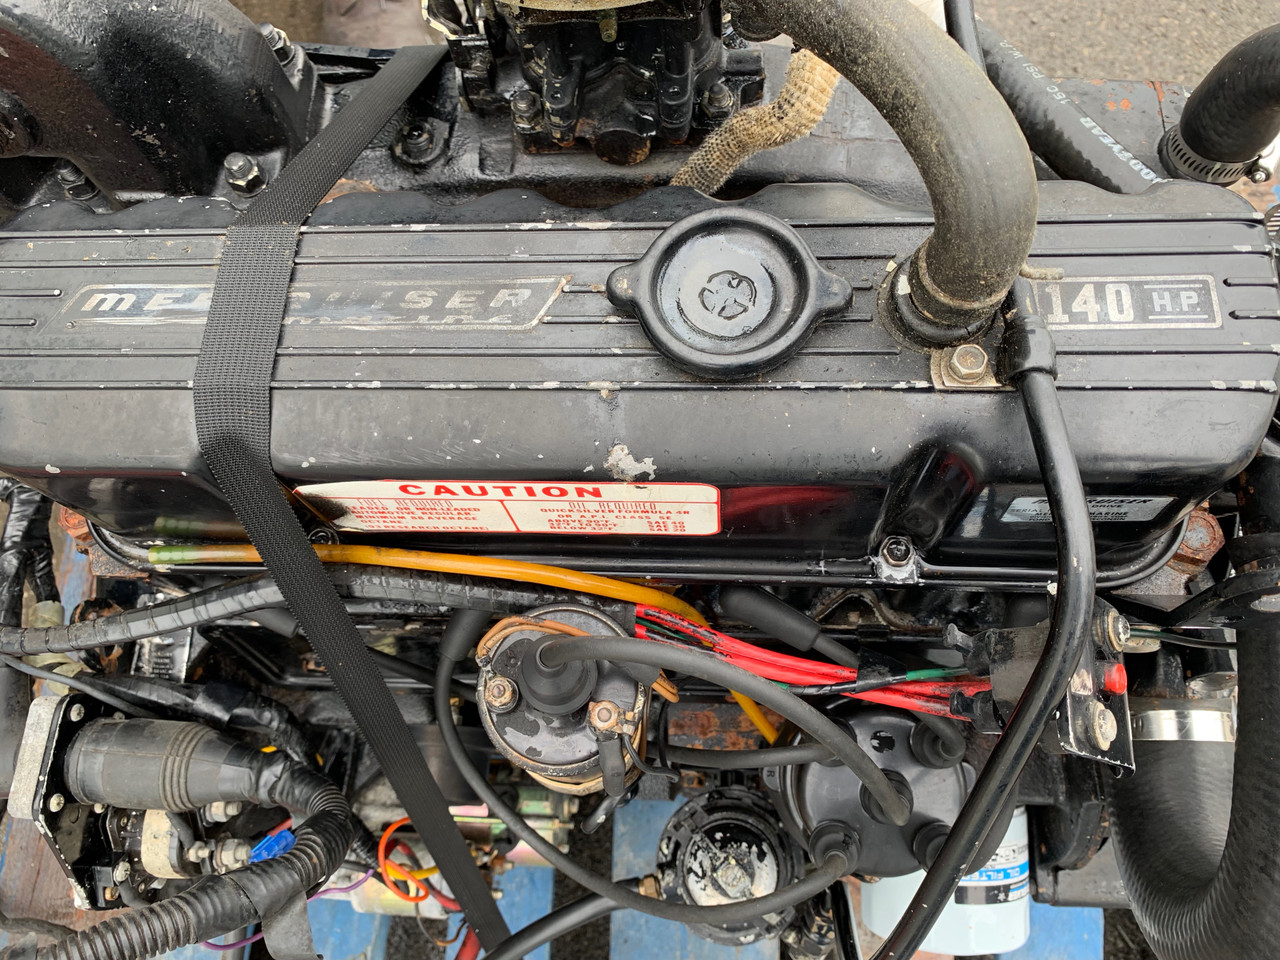 1977 MerCruiser 3.0L 140 HP 4-Cylinder Inboard Motor